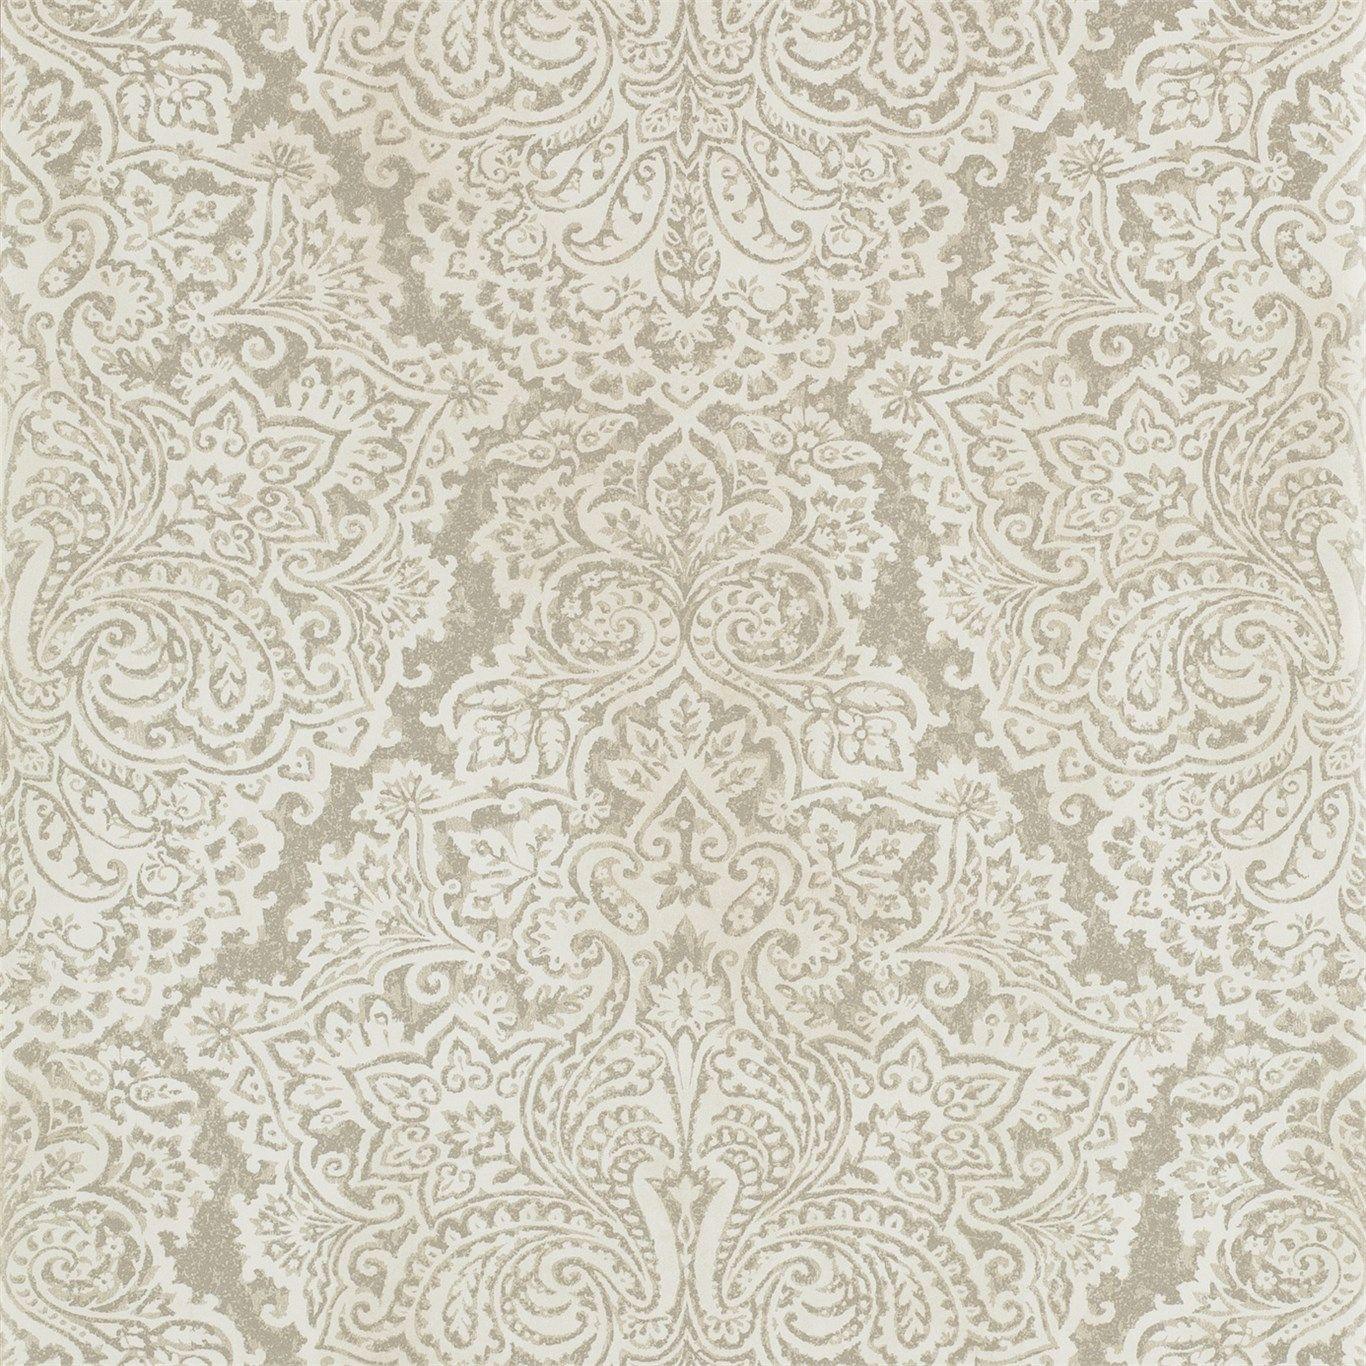 Products   Harlequin - Designer Fabrics and Wallpapers   Aurelia ...